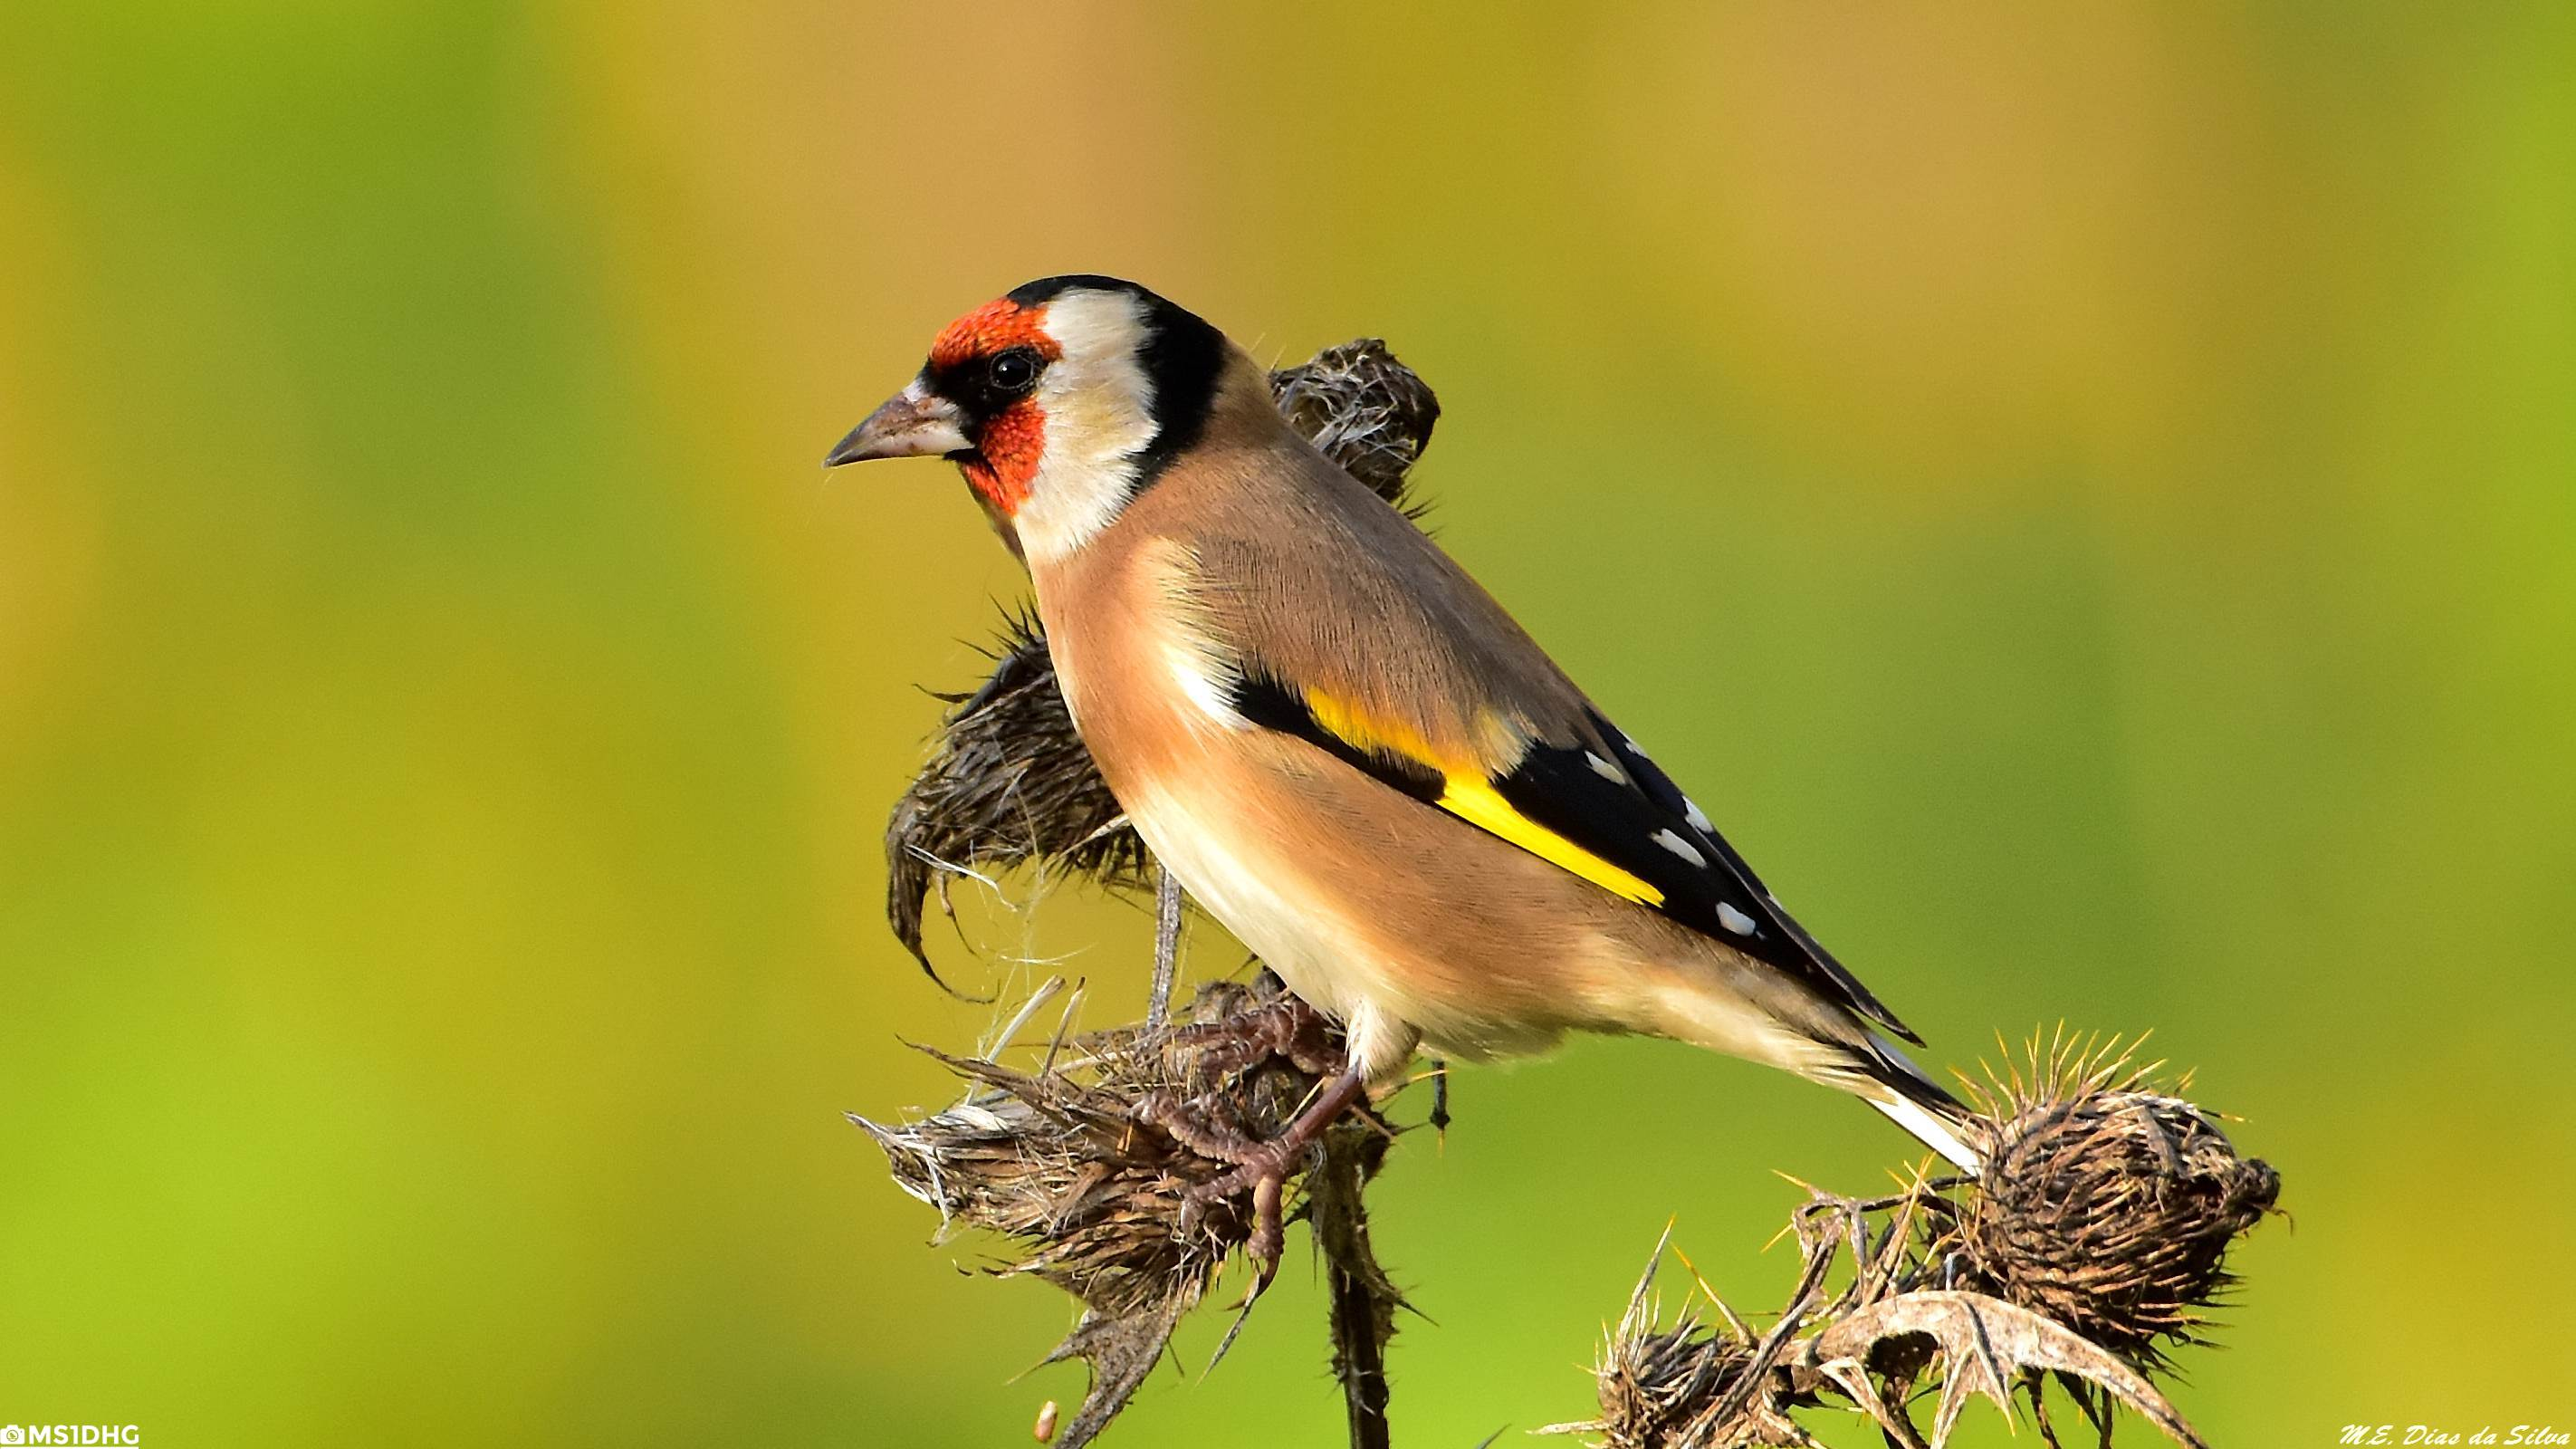 Fórum Aves - Birdwatching em Portugal - Portal Pintassilgo%20(25)